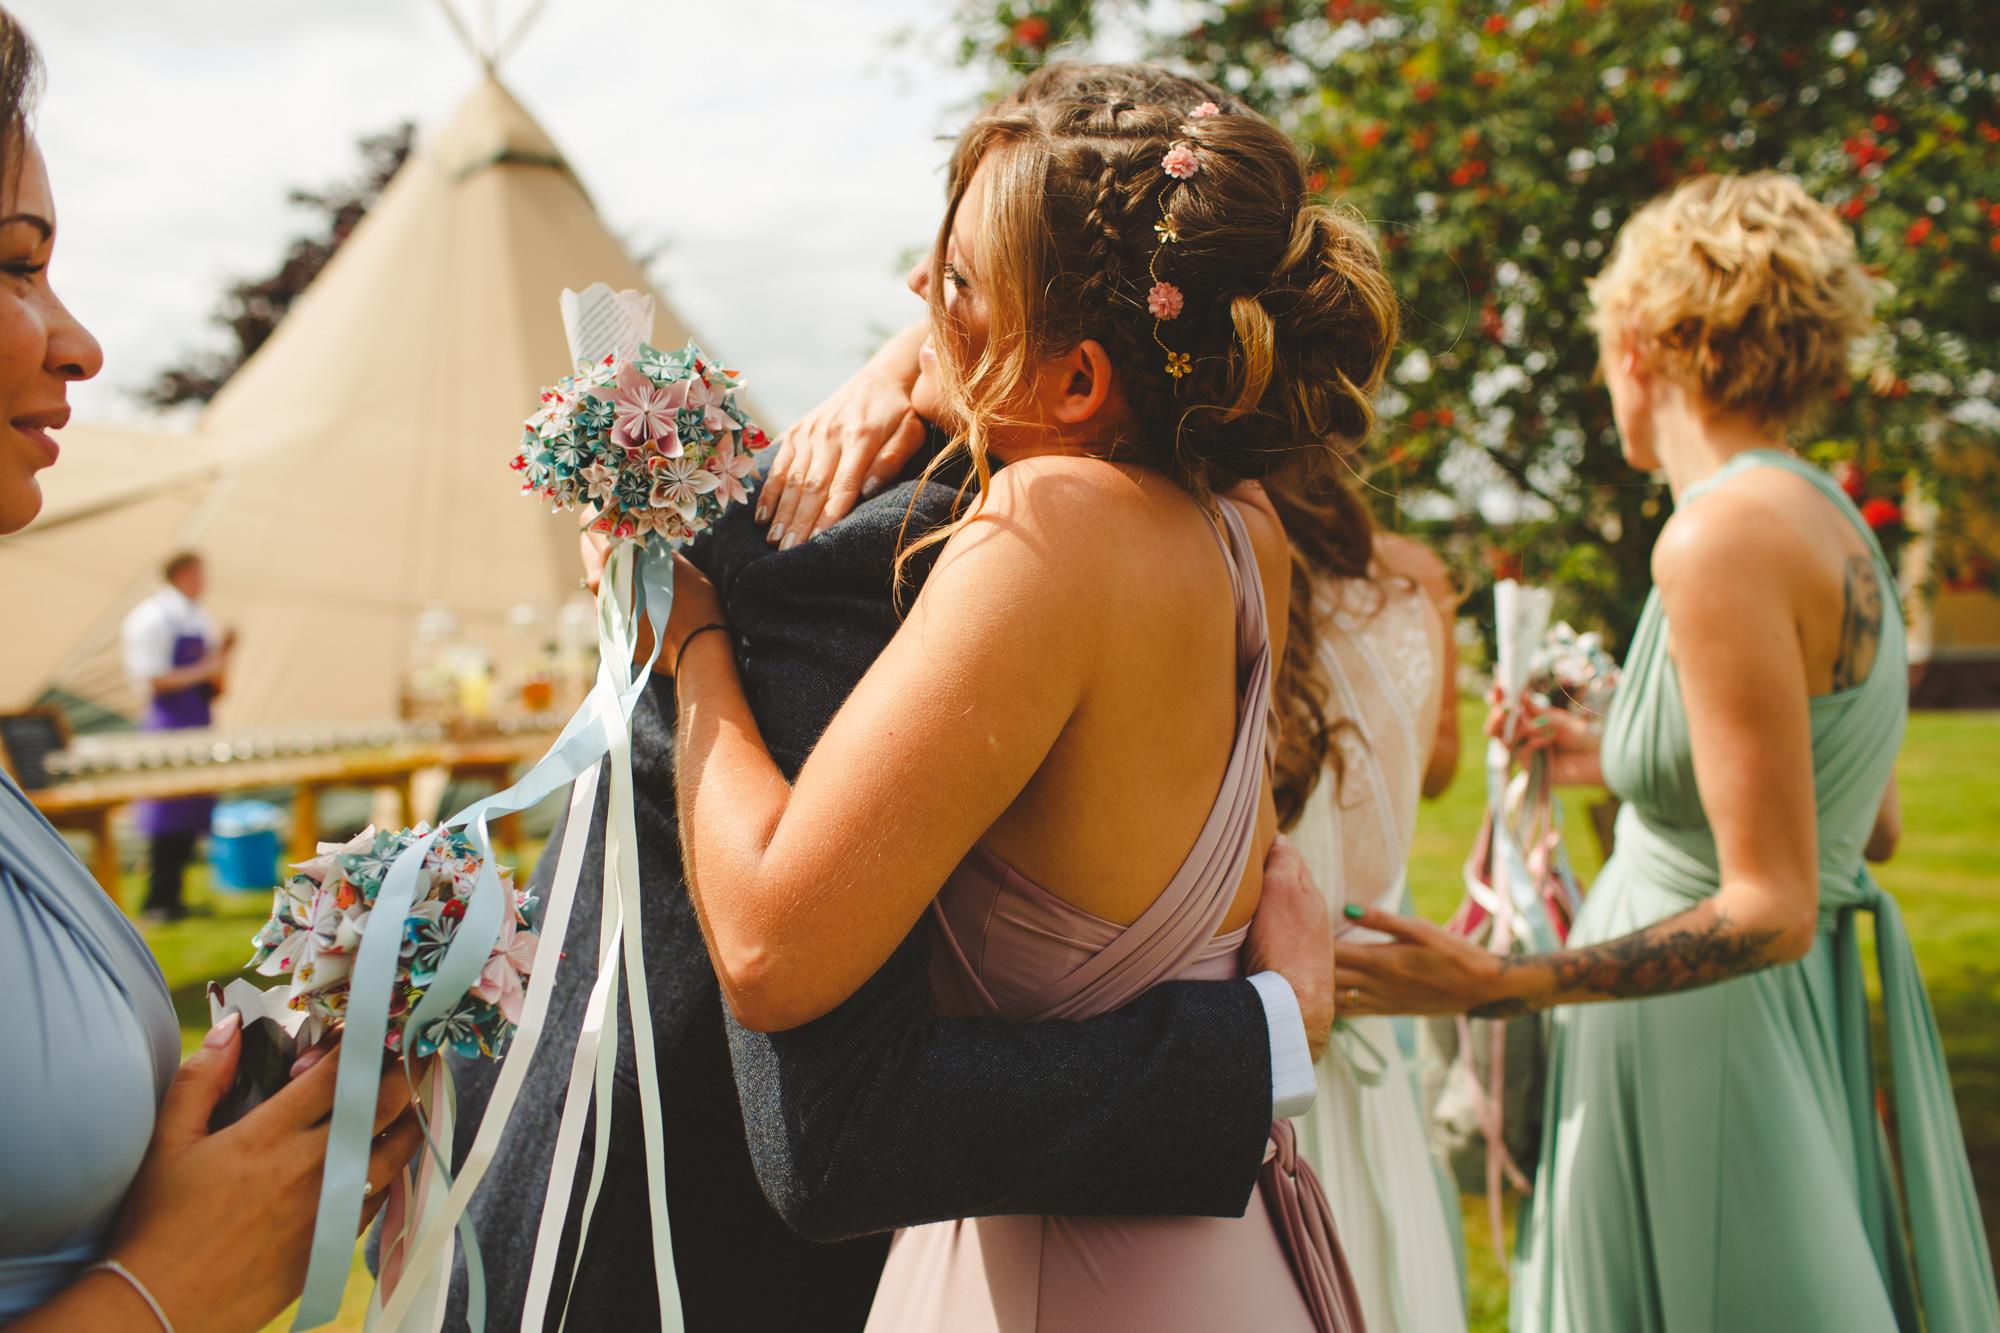 derbyshire-wedding-photographer-filmmaker-carsington-water--6.jpg